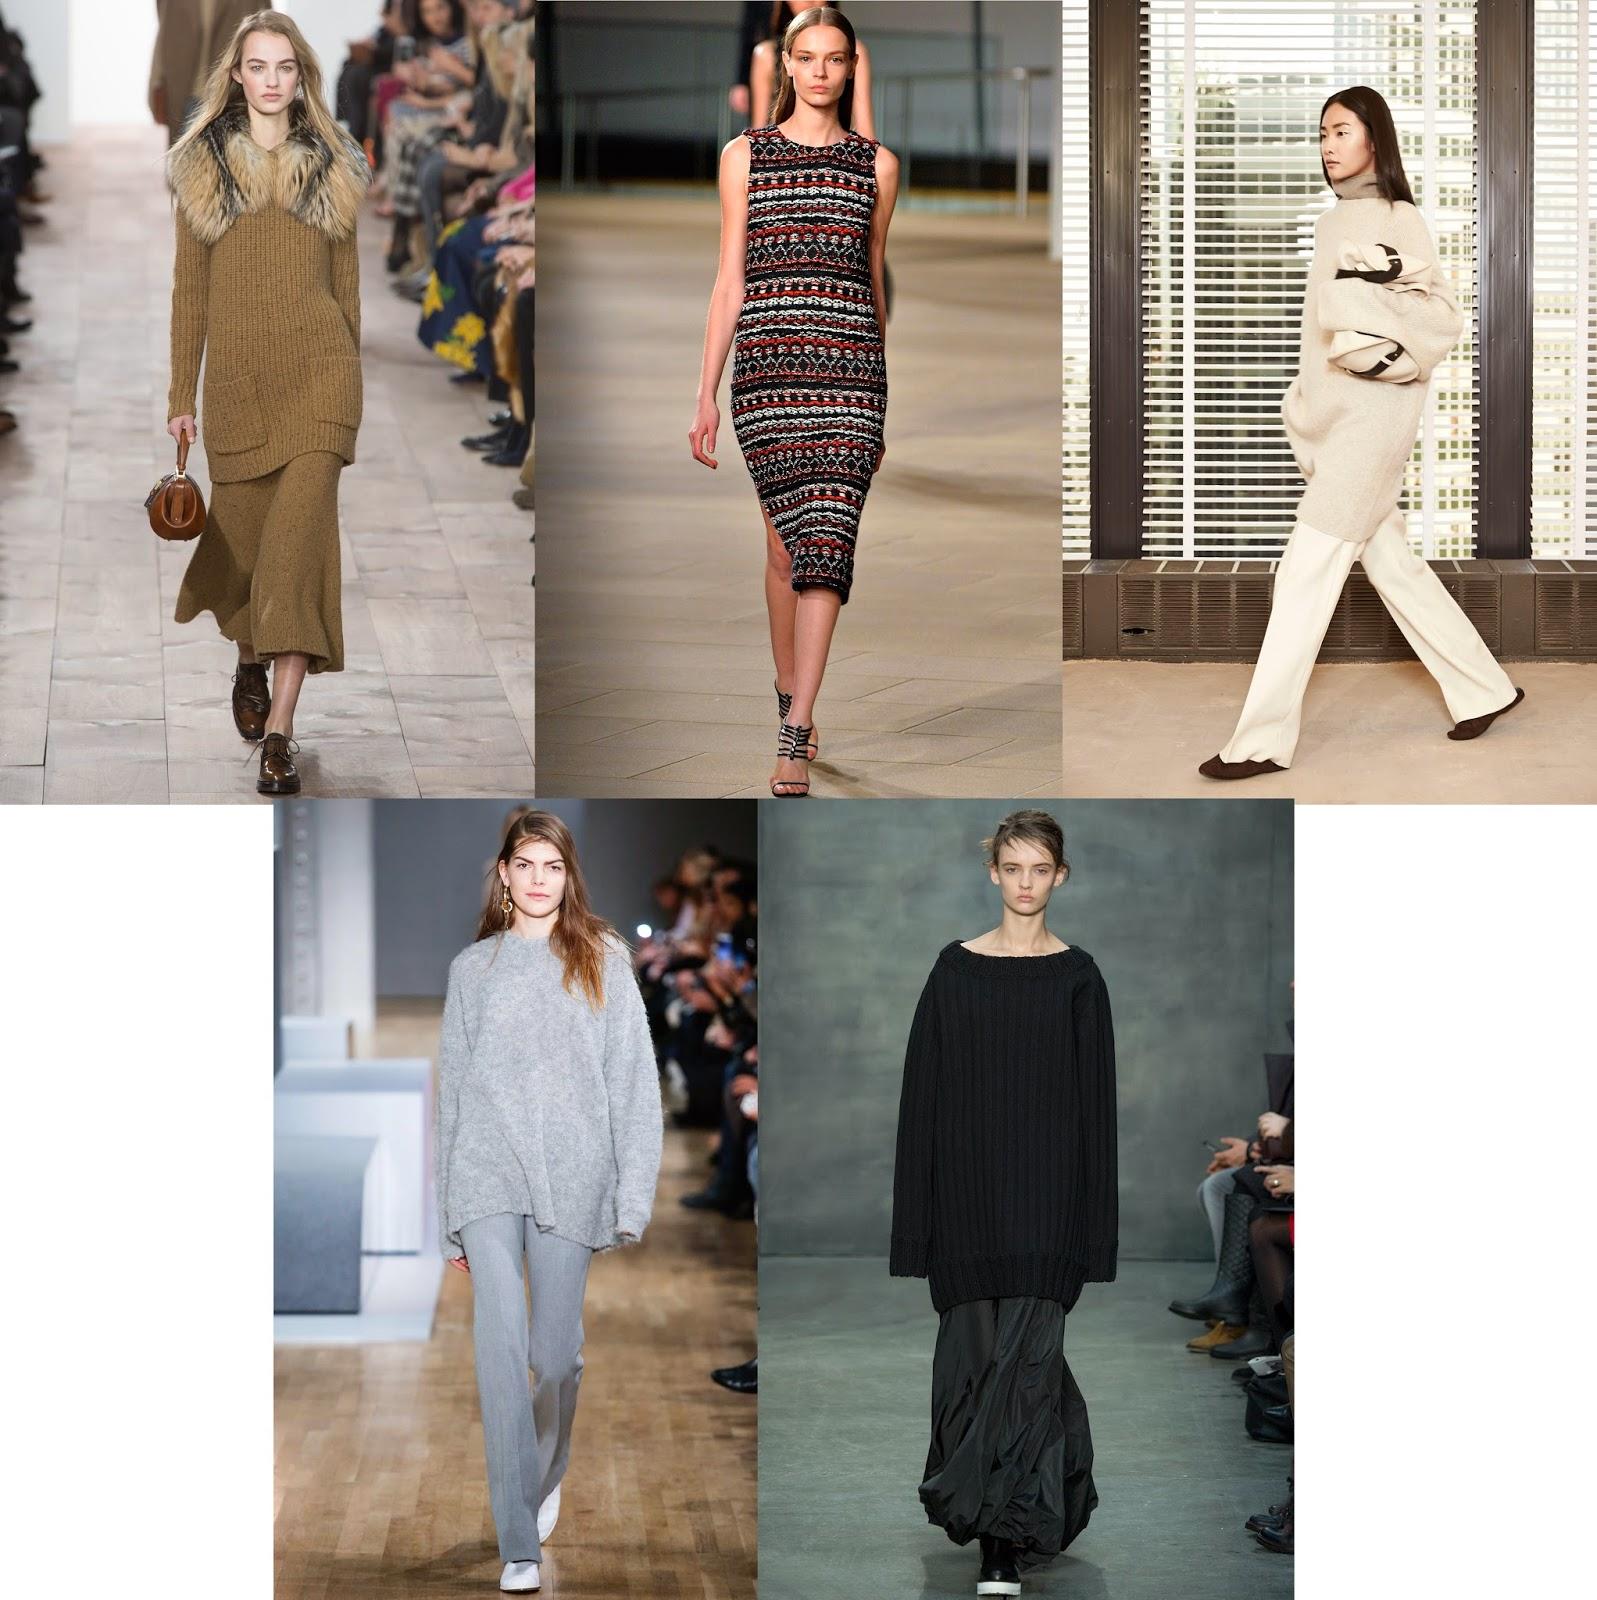 New York Fashion Week Automne Hiver 2015 2016 Paperblog